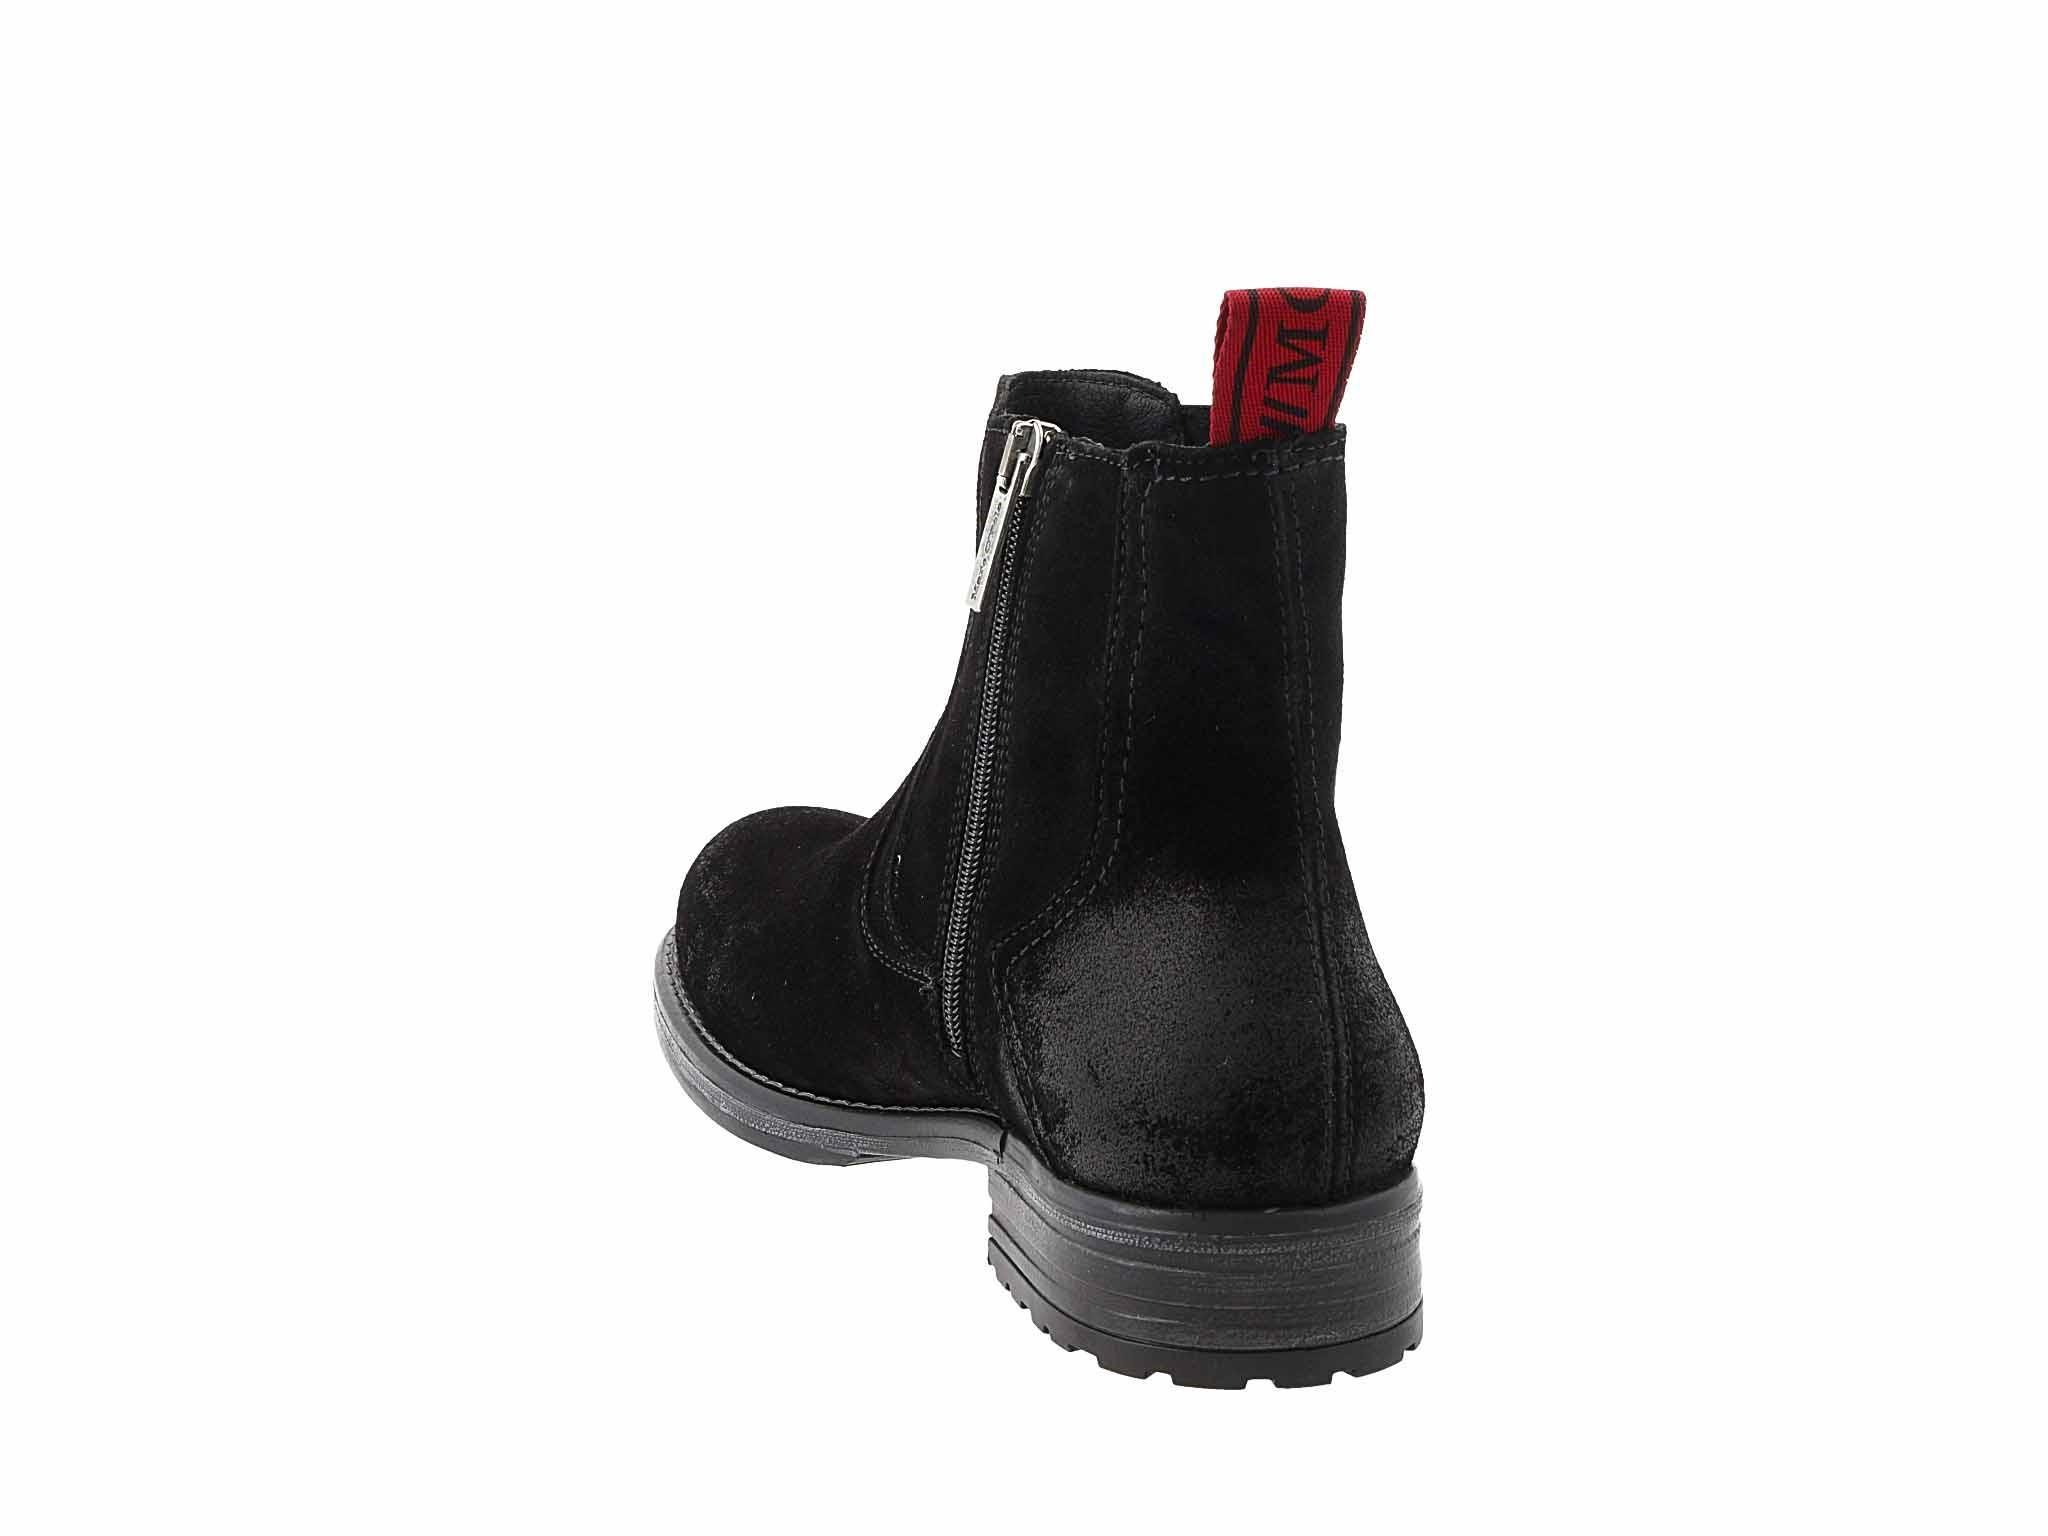 Kozaki MARC O'POLO - 907 25005001 300 Black 990